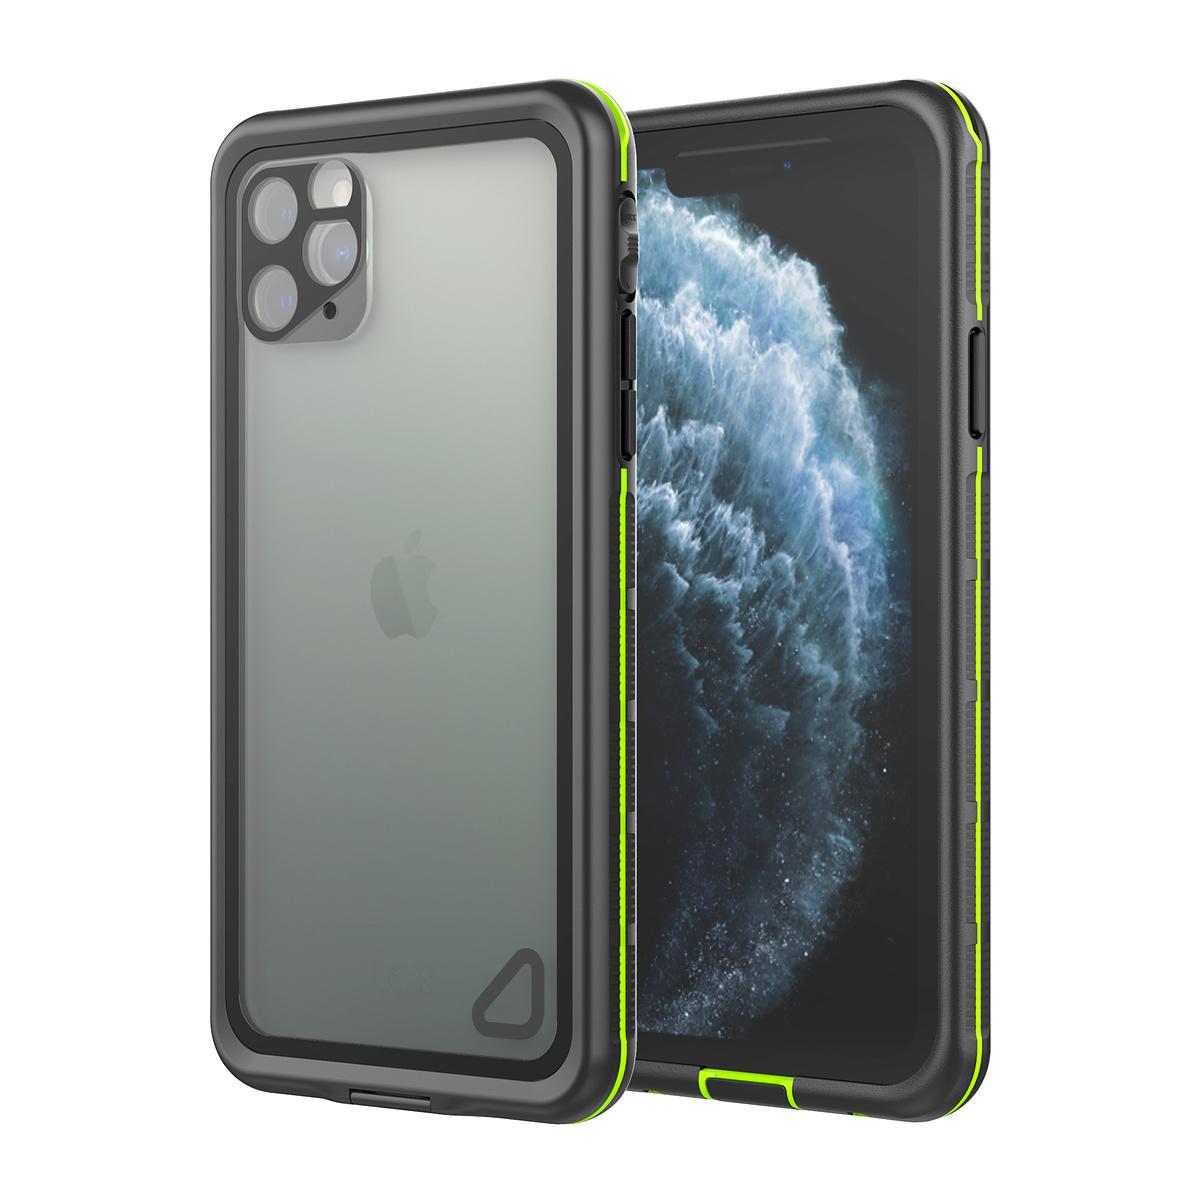 Vattentätt TPU IPX68 Skal till iPhone 11 Pro Max, svart